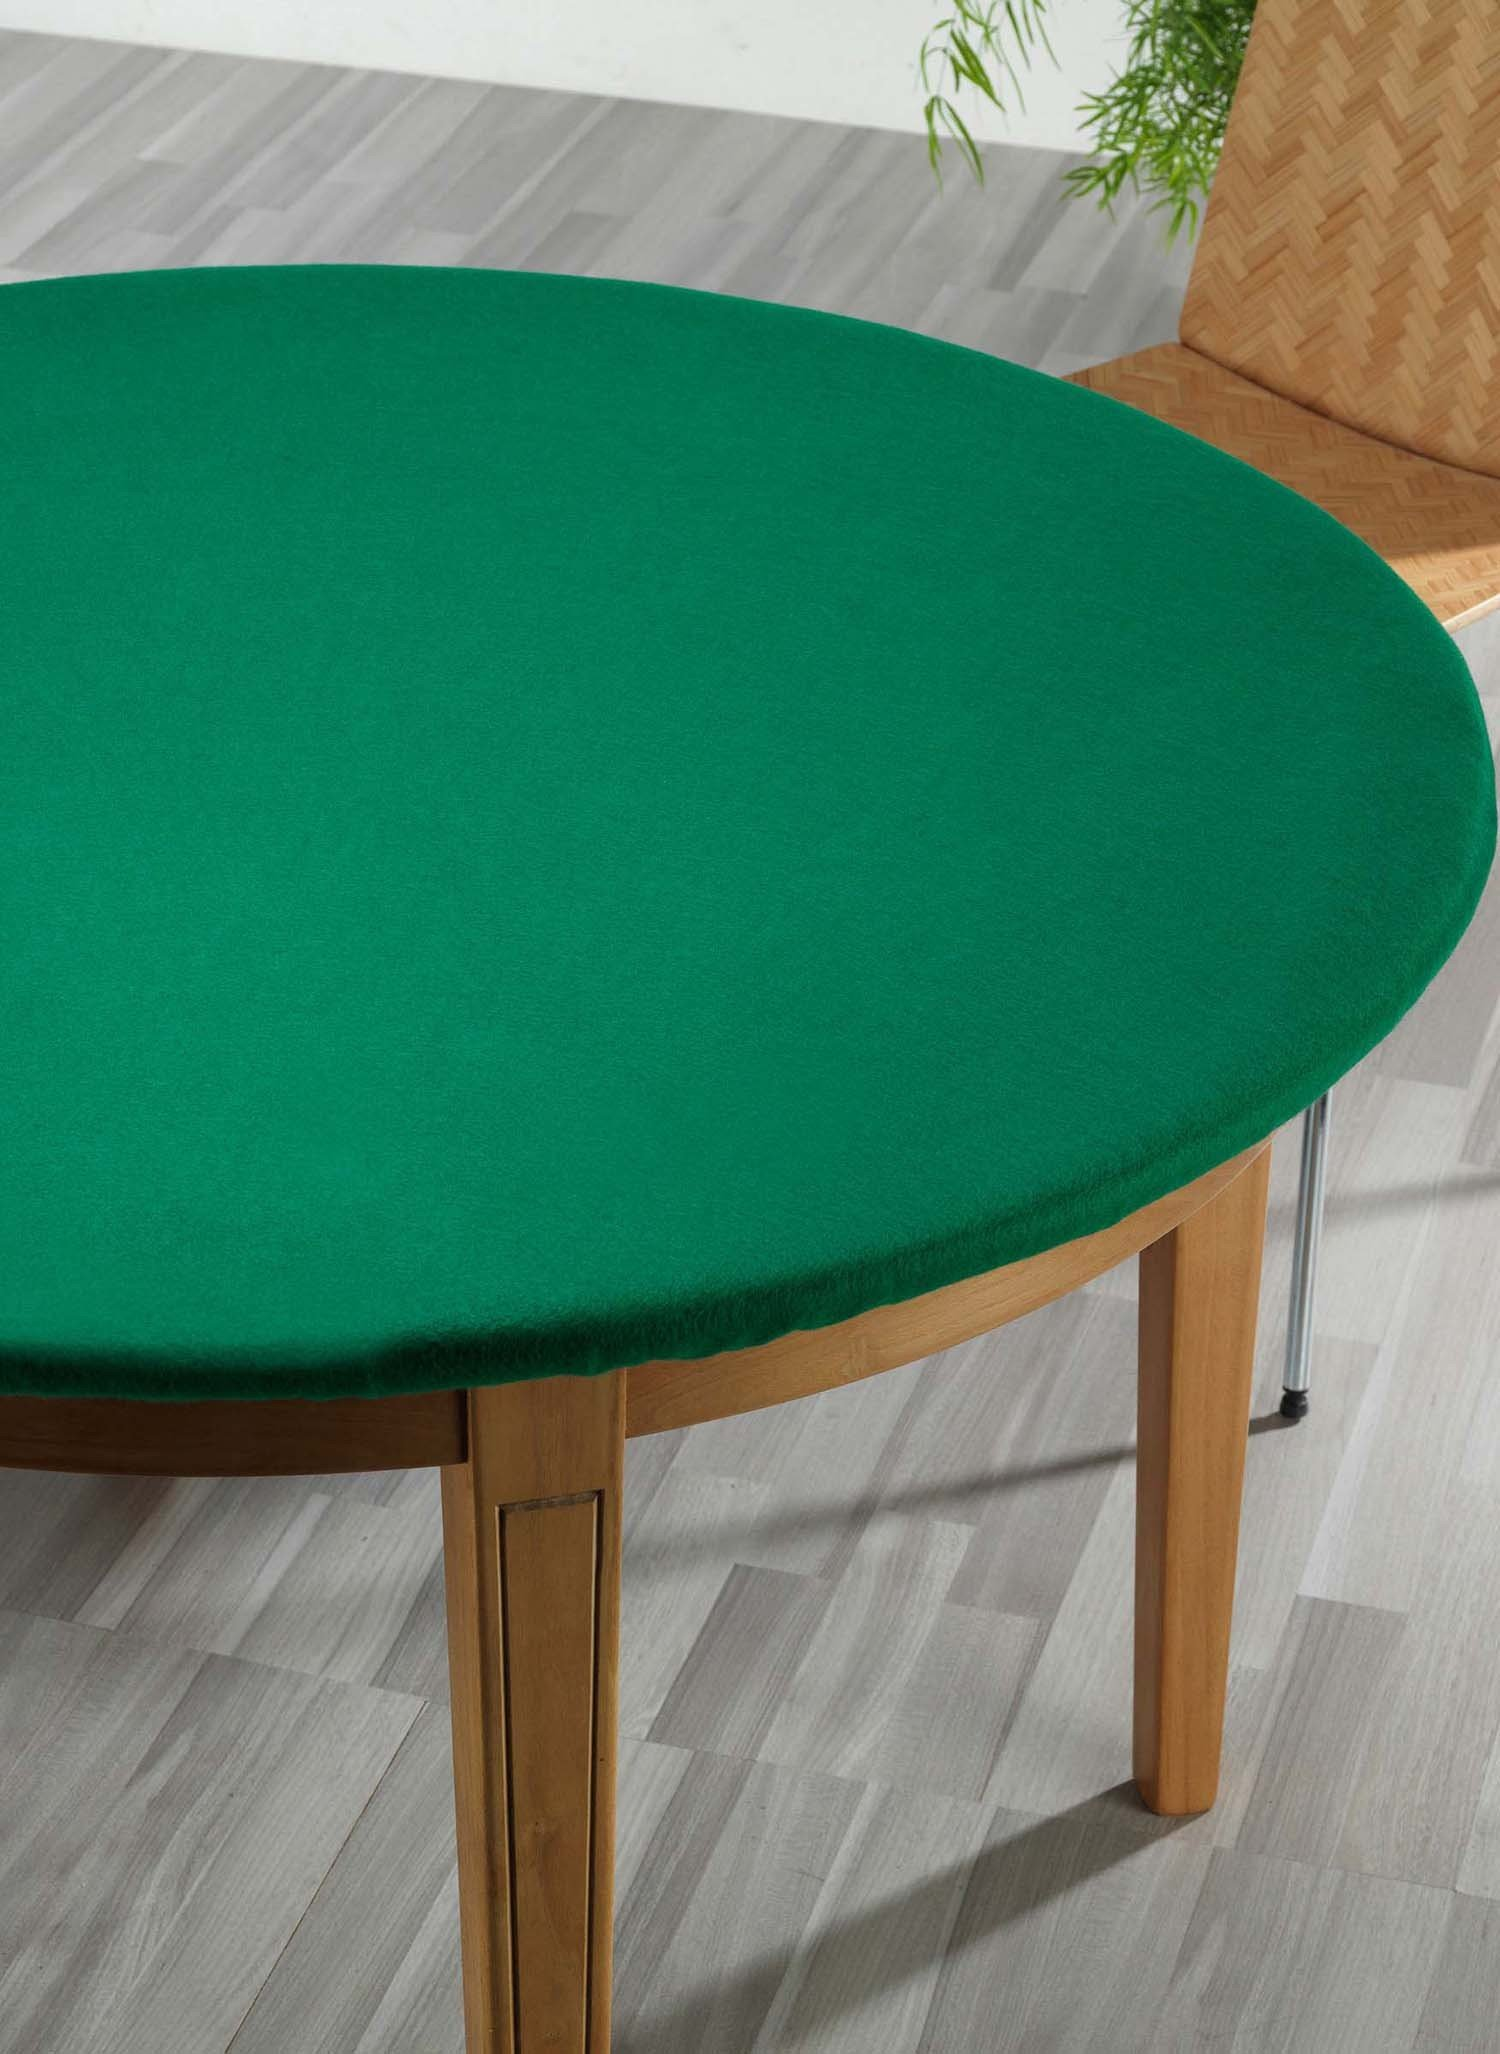 Mollettone-tavolo D.F. 140x140